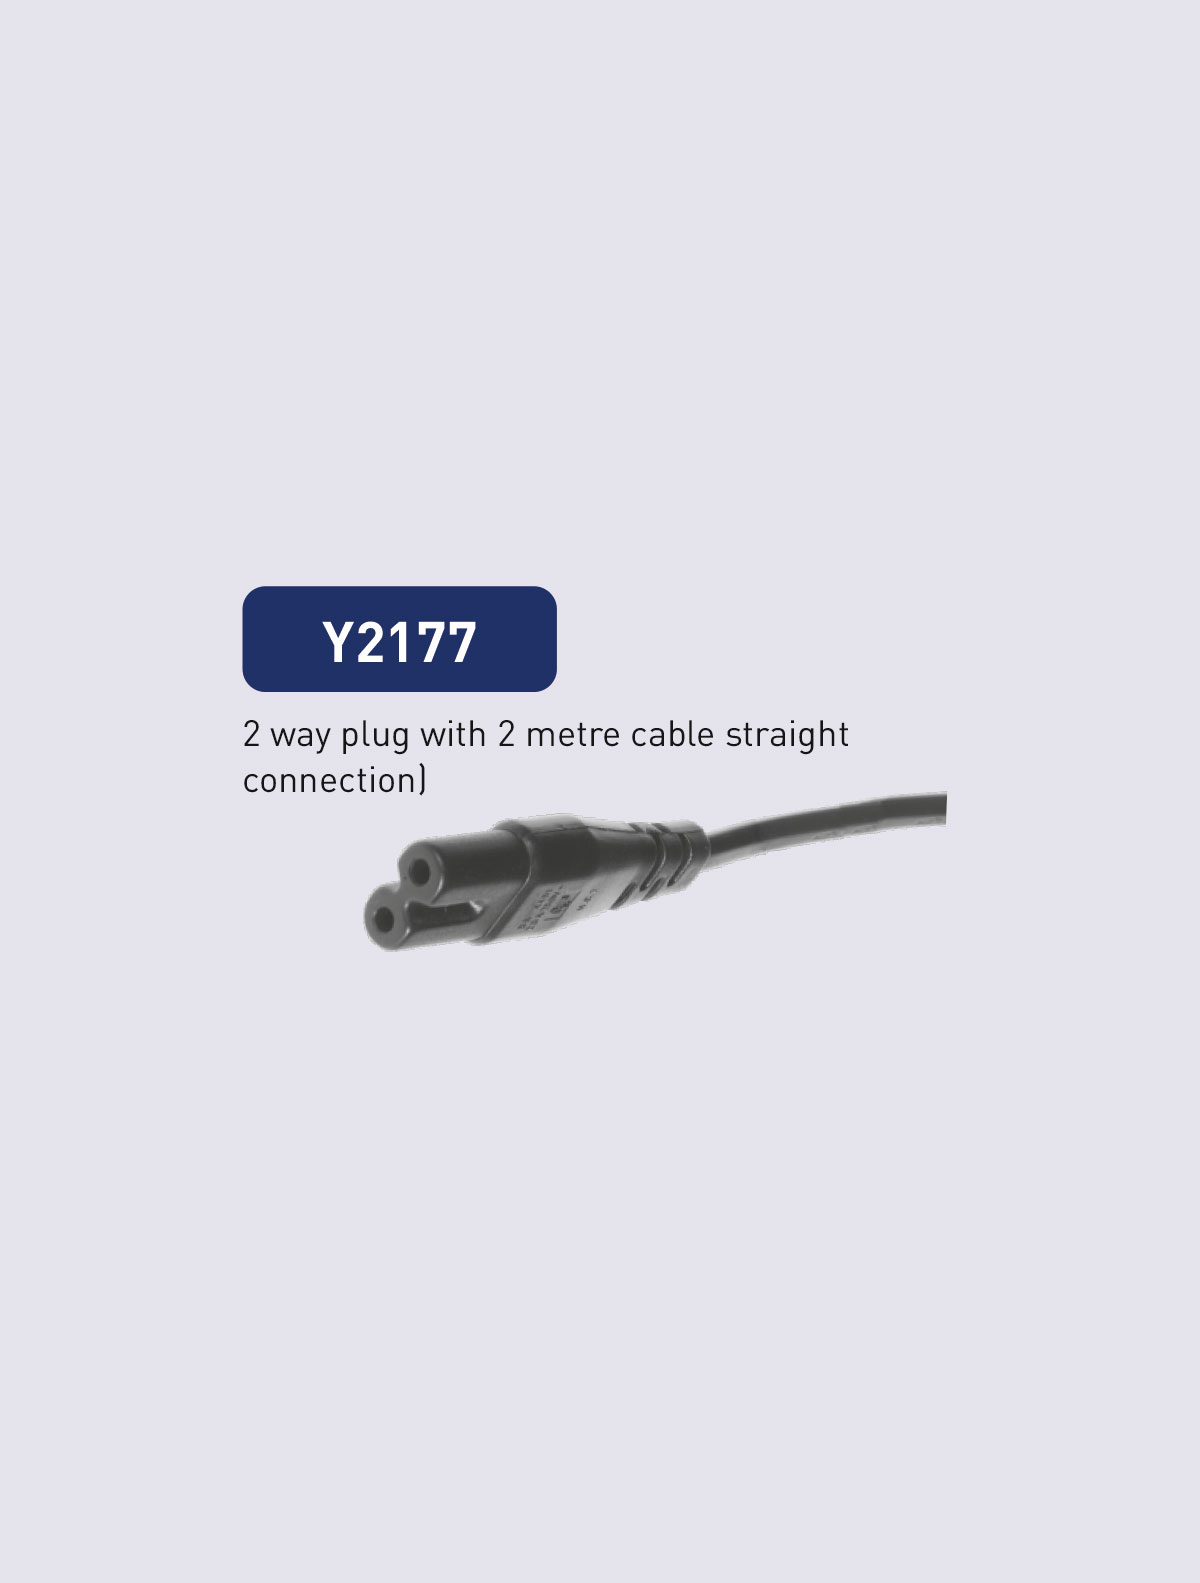 Y2177